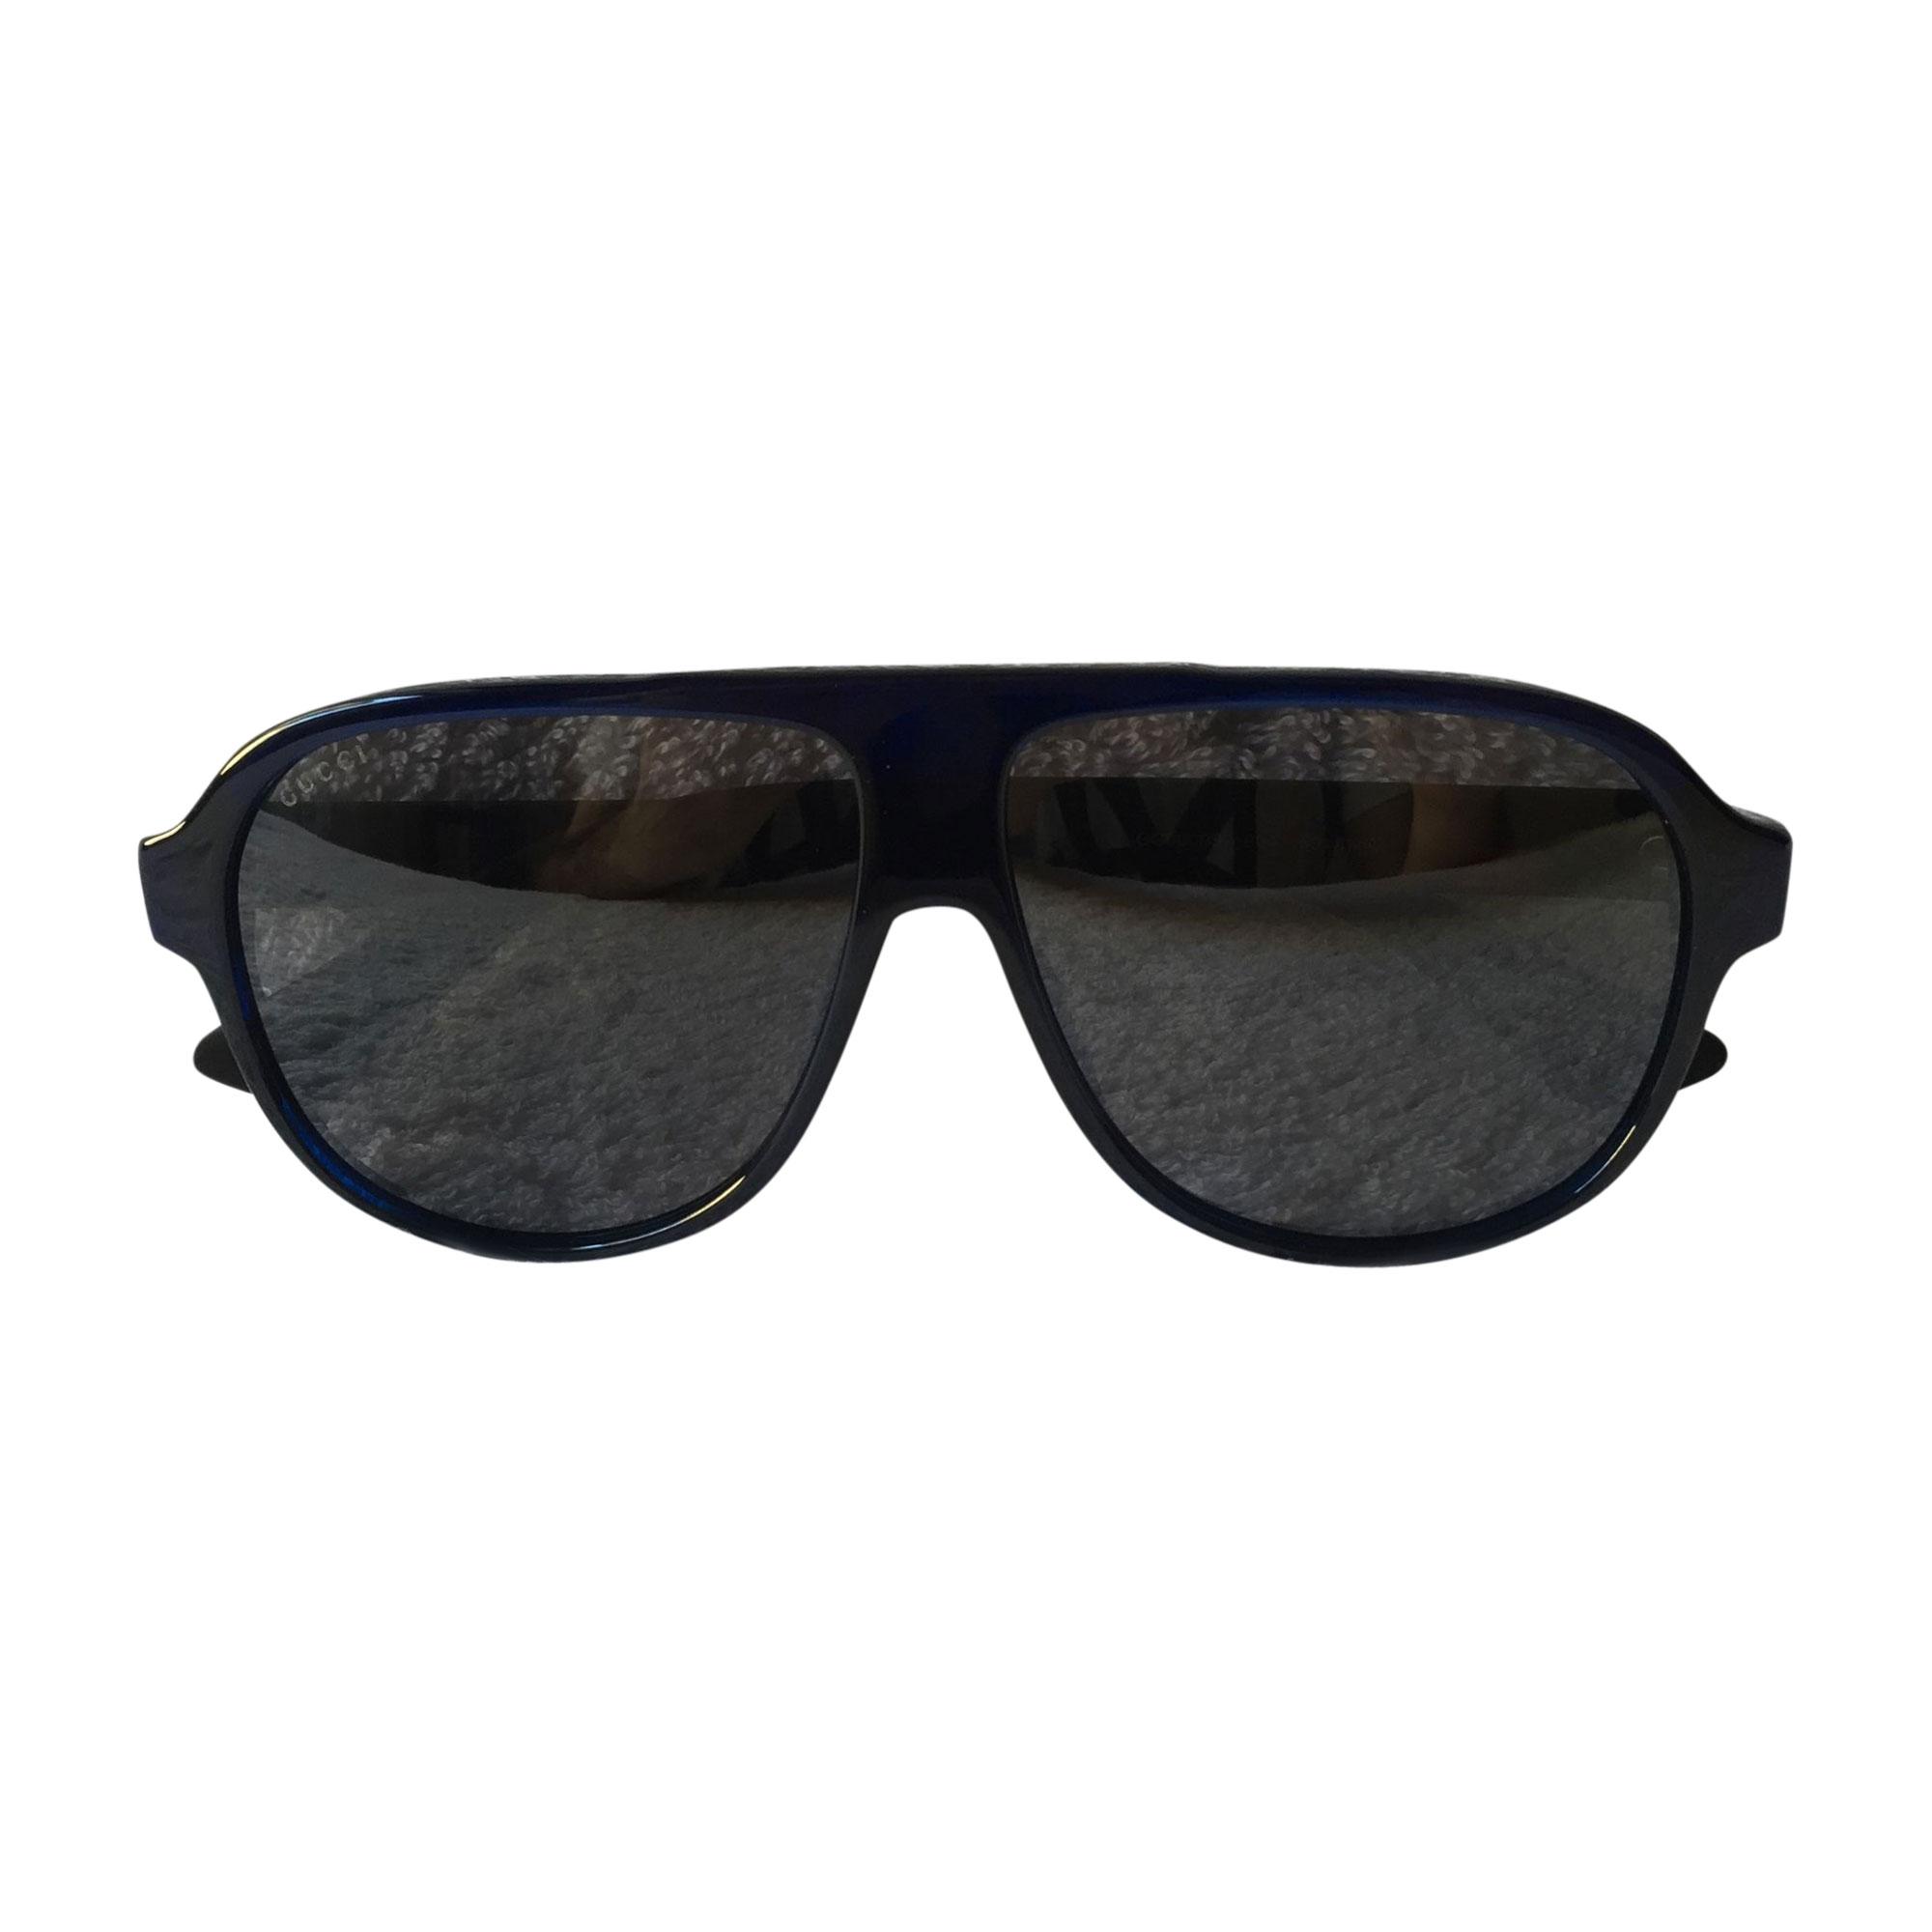 Sonnenbrille GUCCI Blau, marineblau, türkisblau